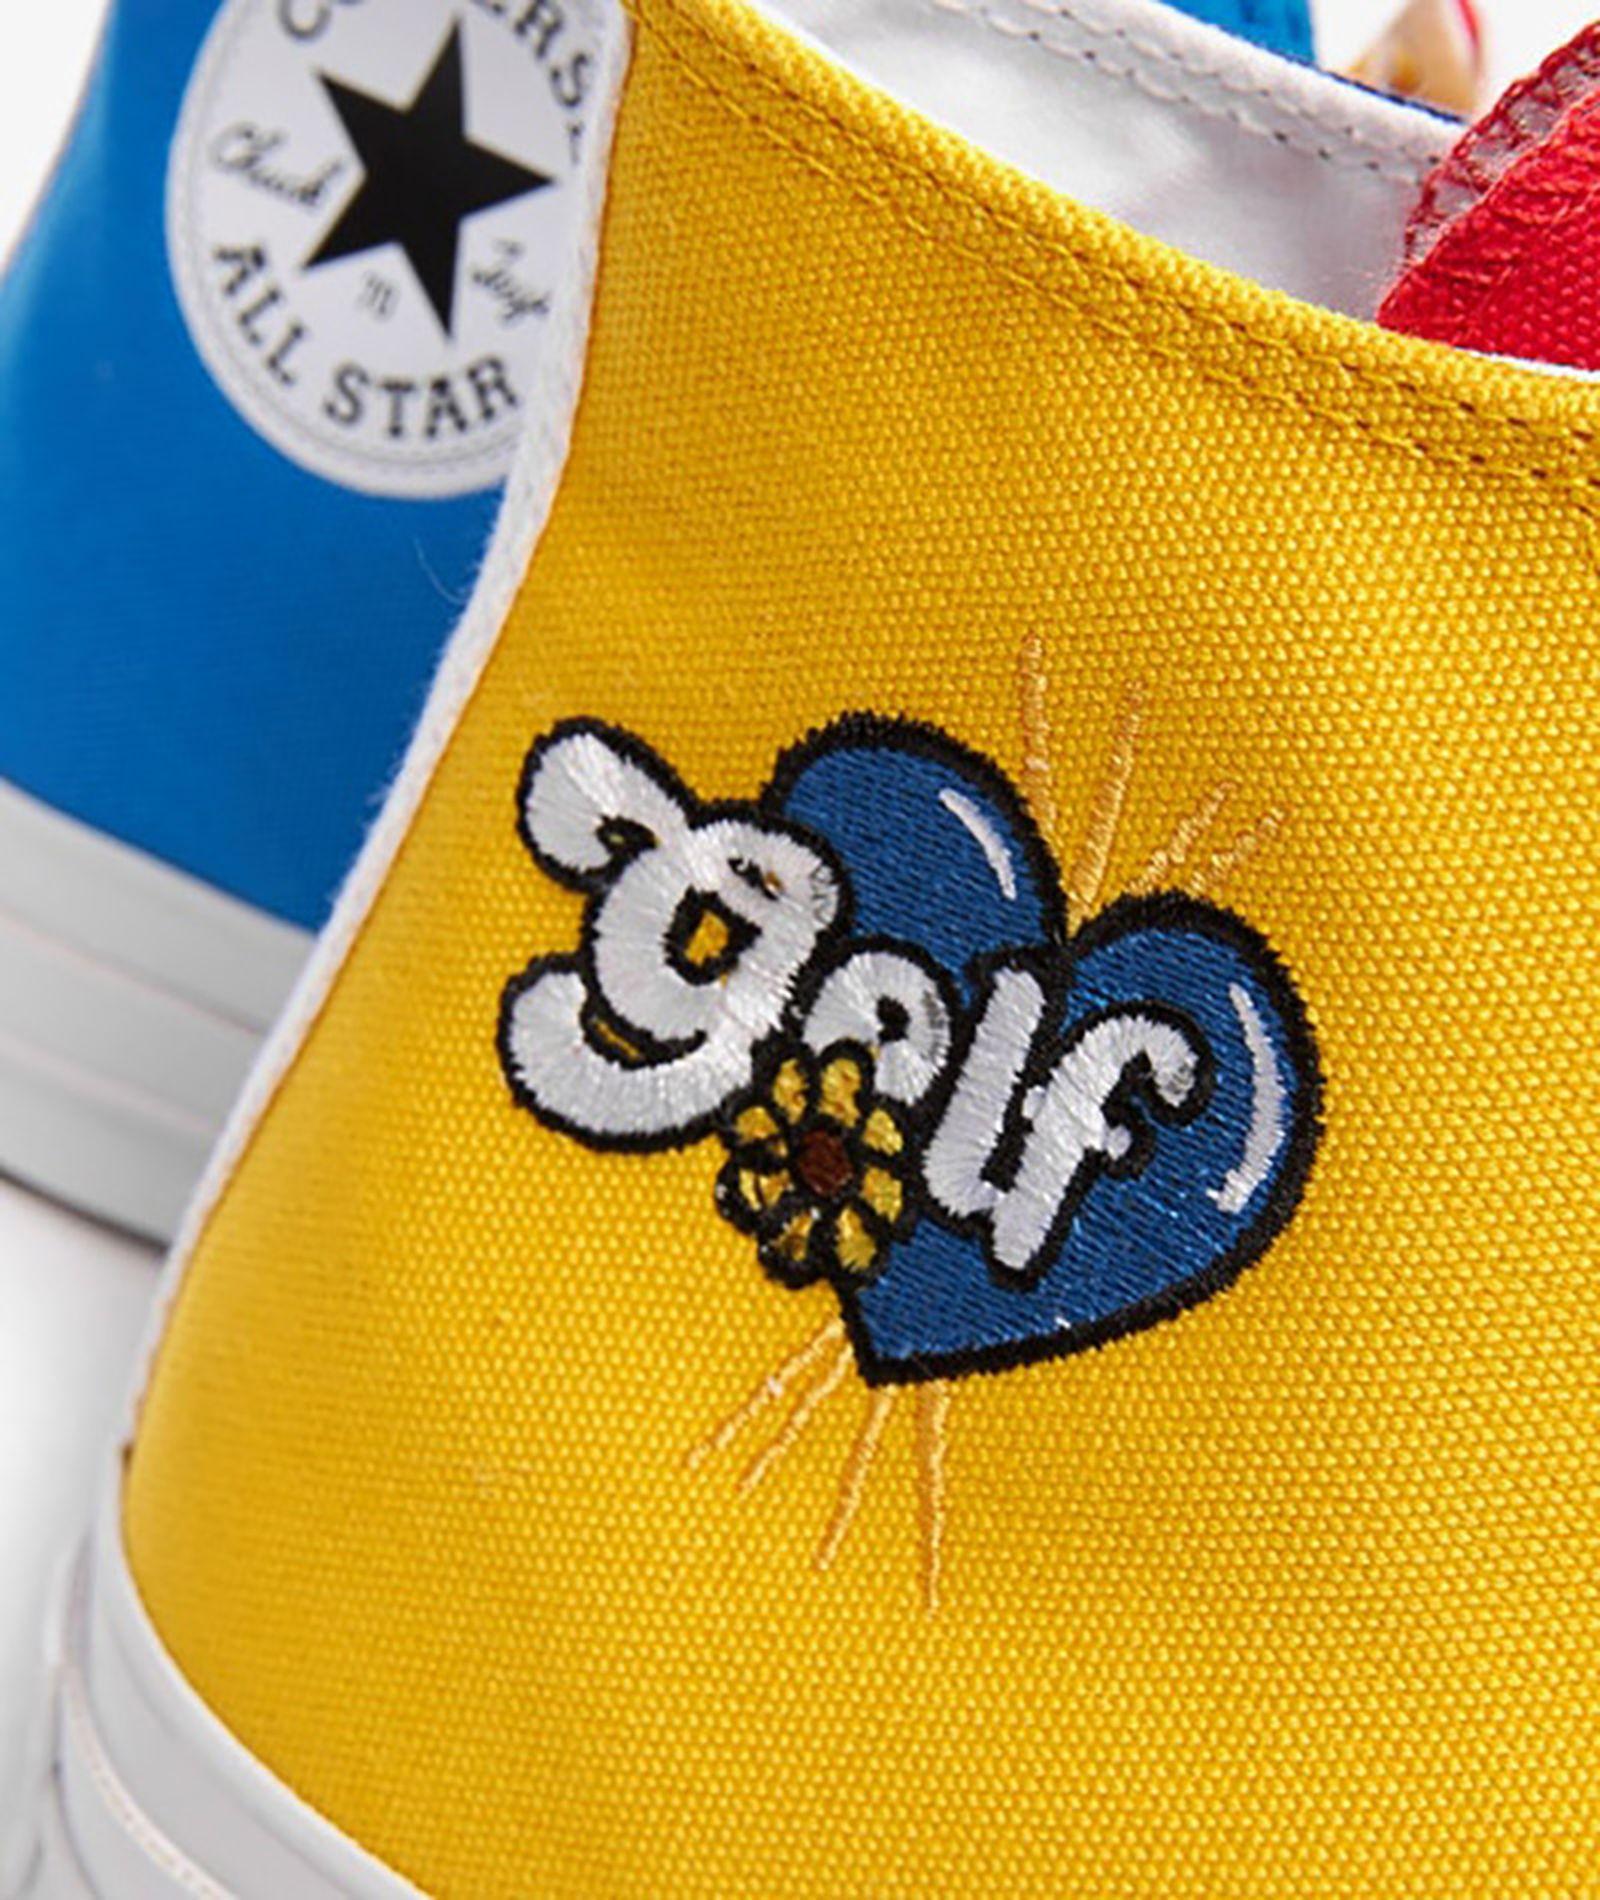 golf-wang-converse-chuck-70-hi-tri-panel-release-date-price-06